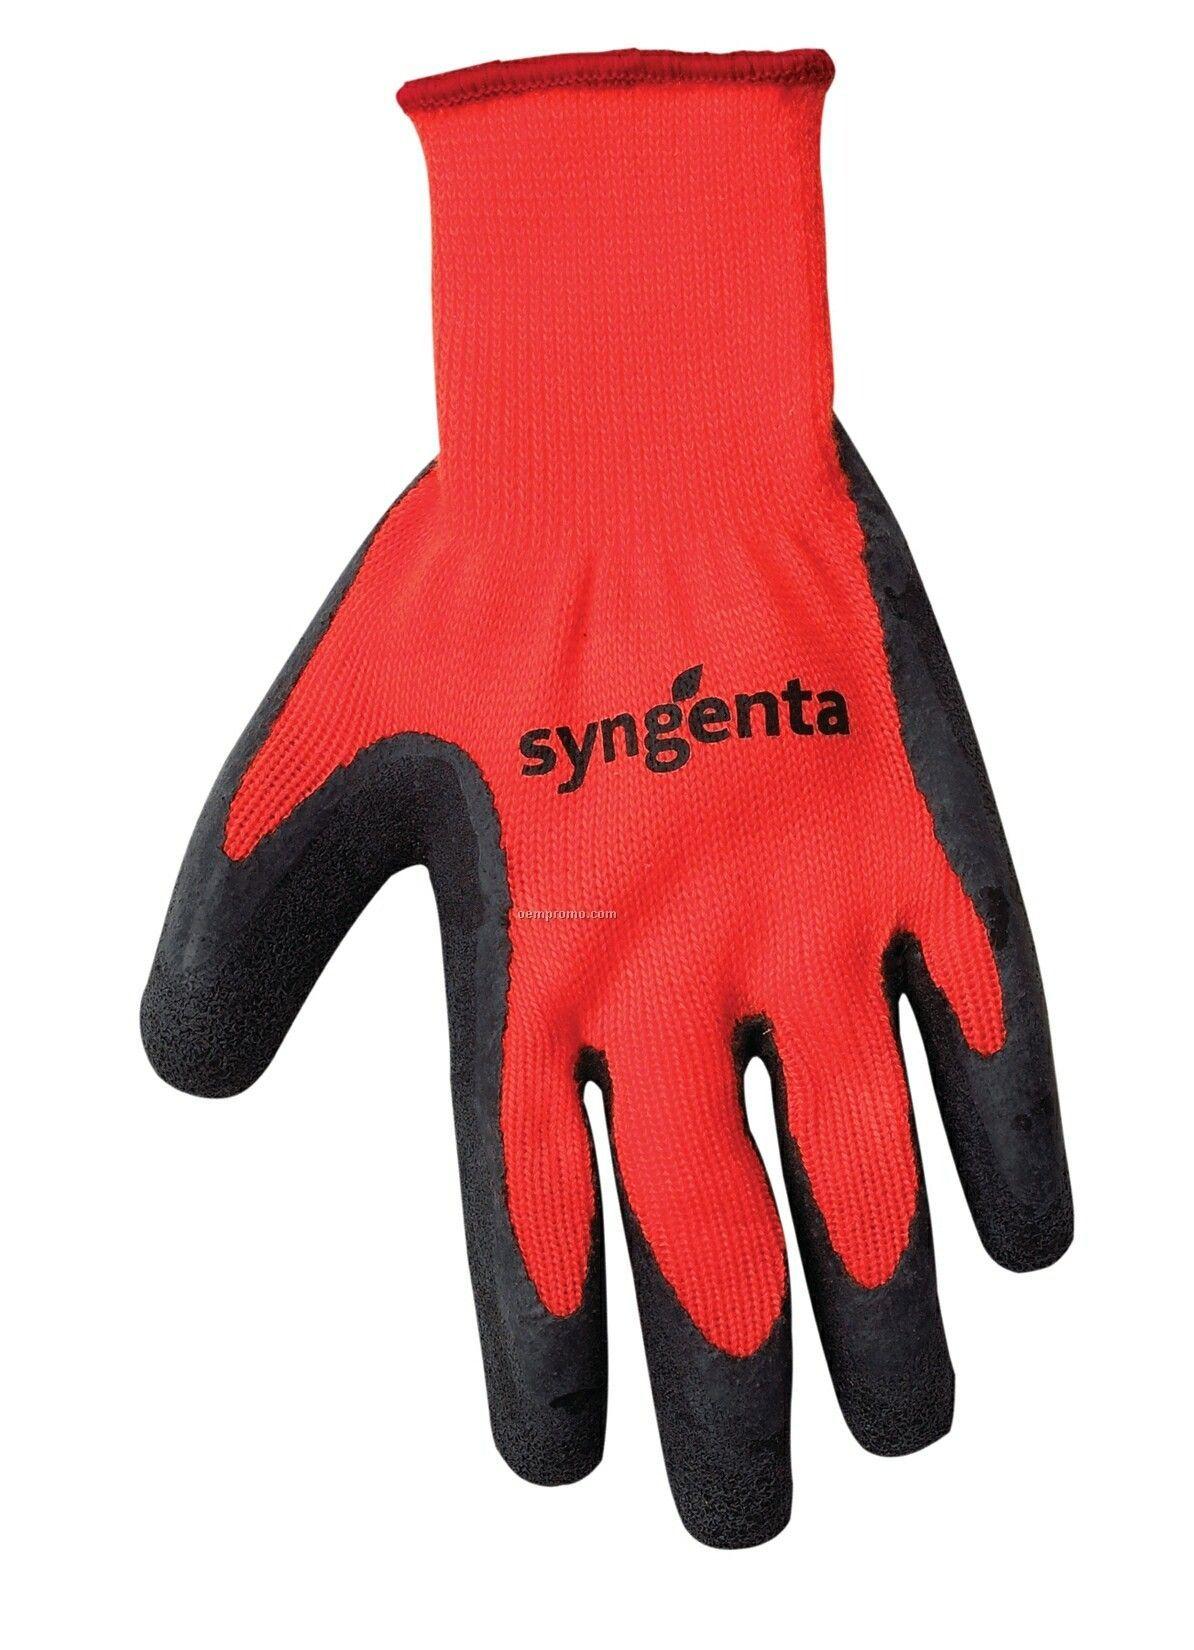 black single women in clute Single palm cotton gloves hand protection, cotton gloves, cotton canvas, 100% cotton, clute cut, straight thumb, knit wrist, 8 & 12-oz, natural color, sizes: men's & women's, dozen.